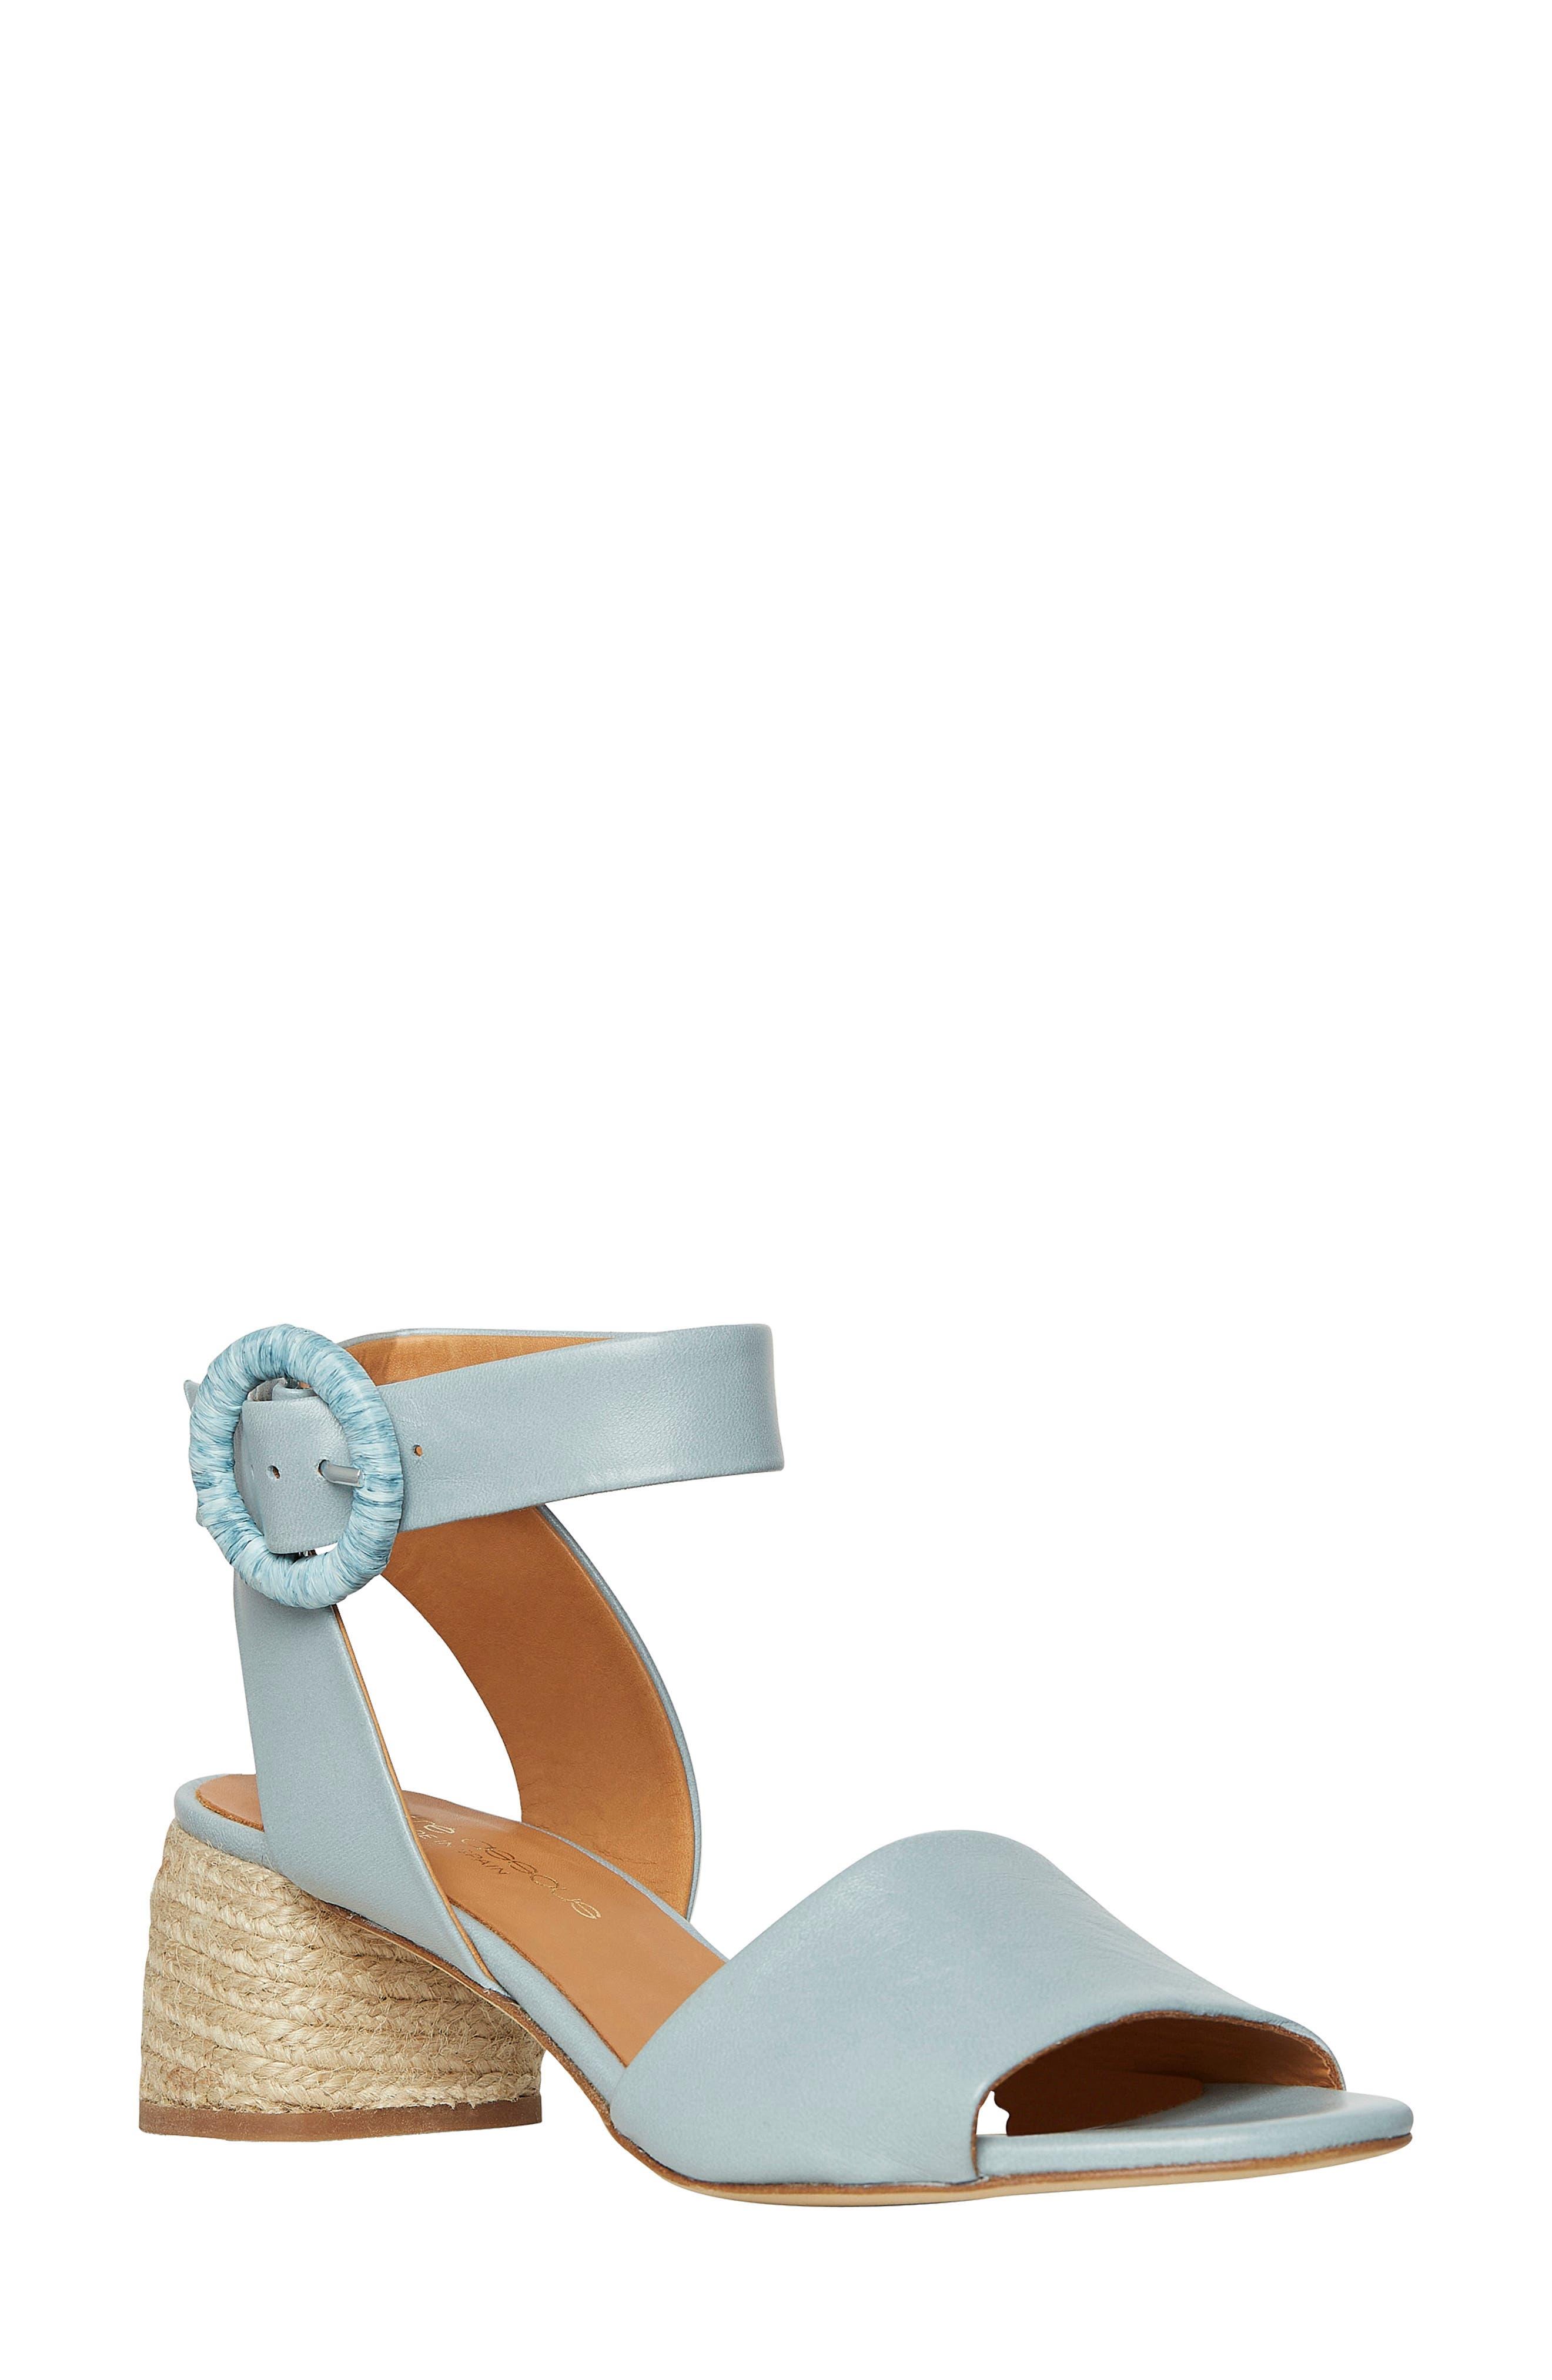 Coelest Ankle Strap Sandal